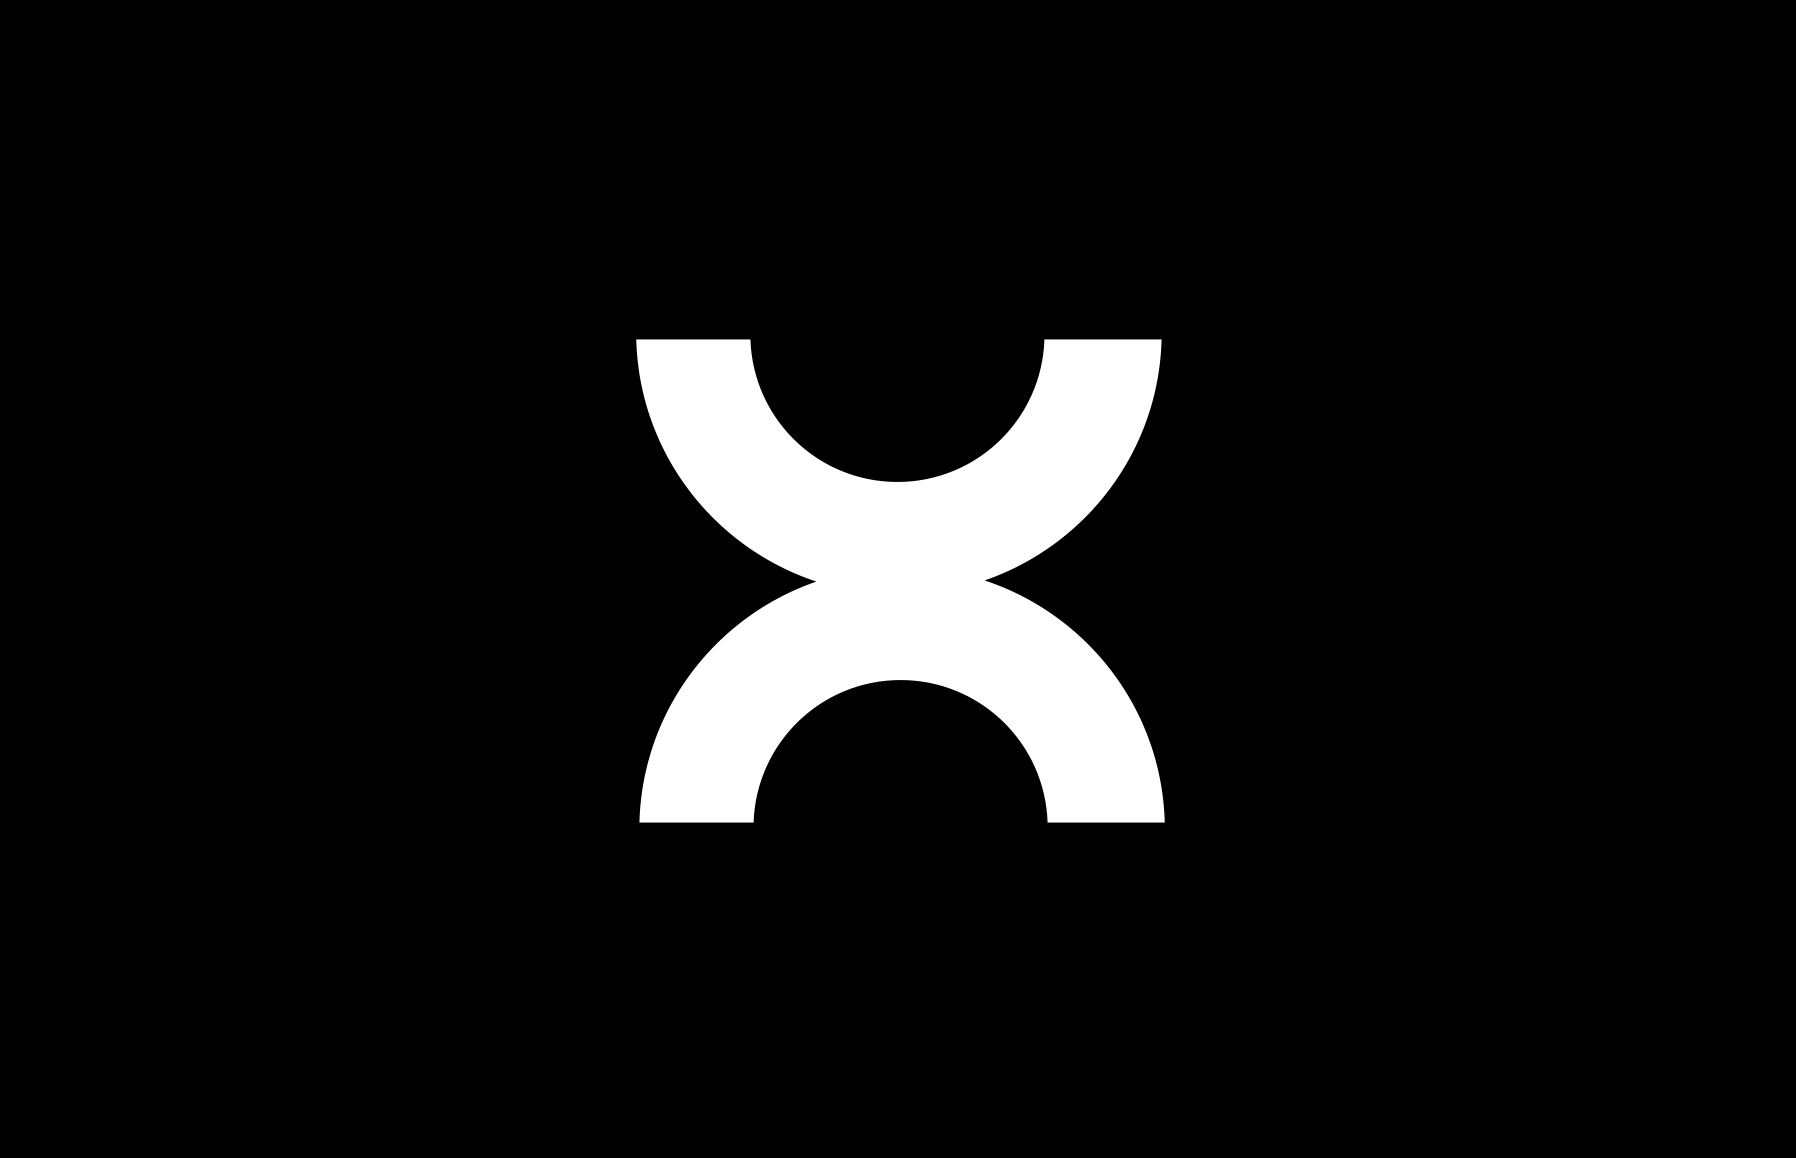 Pixerymedia